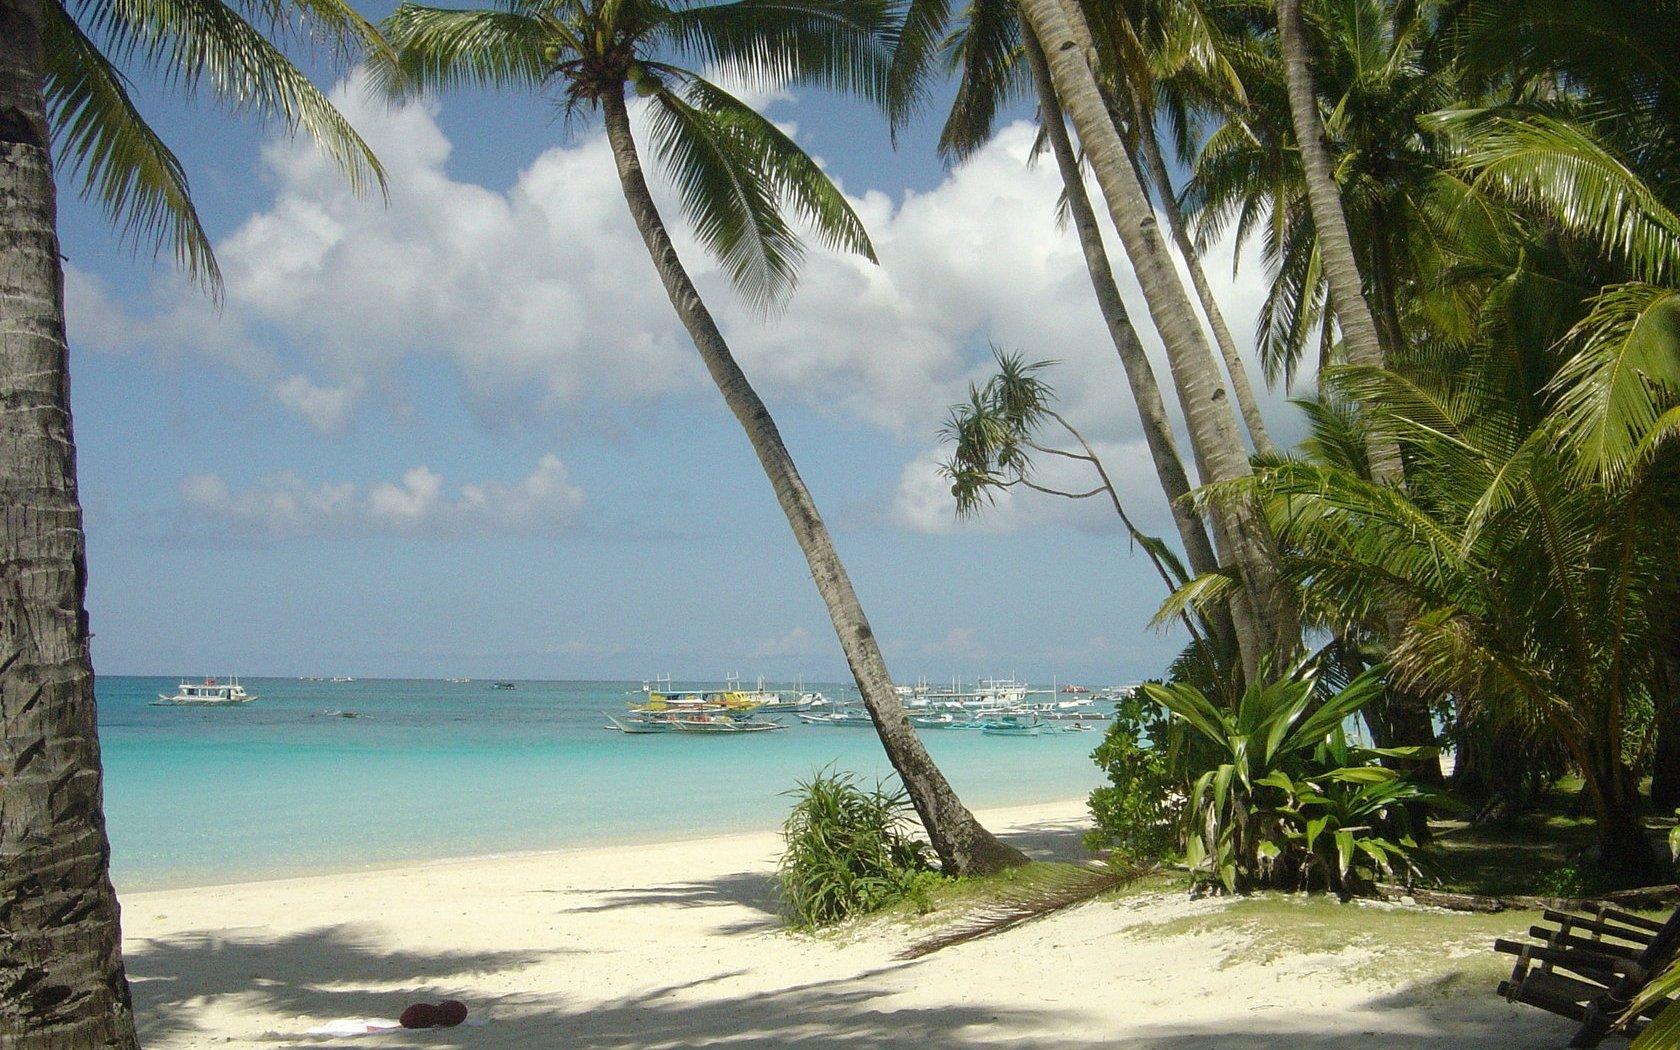 boracay beach hq wide - photo #21